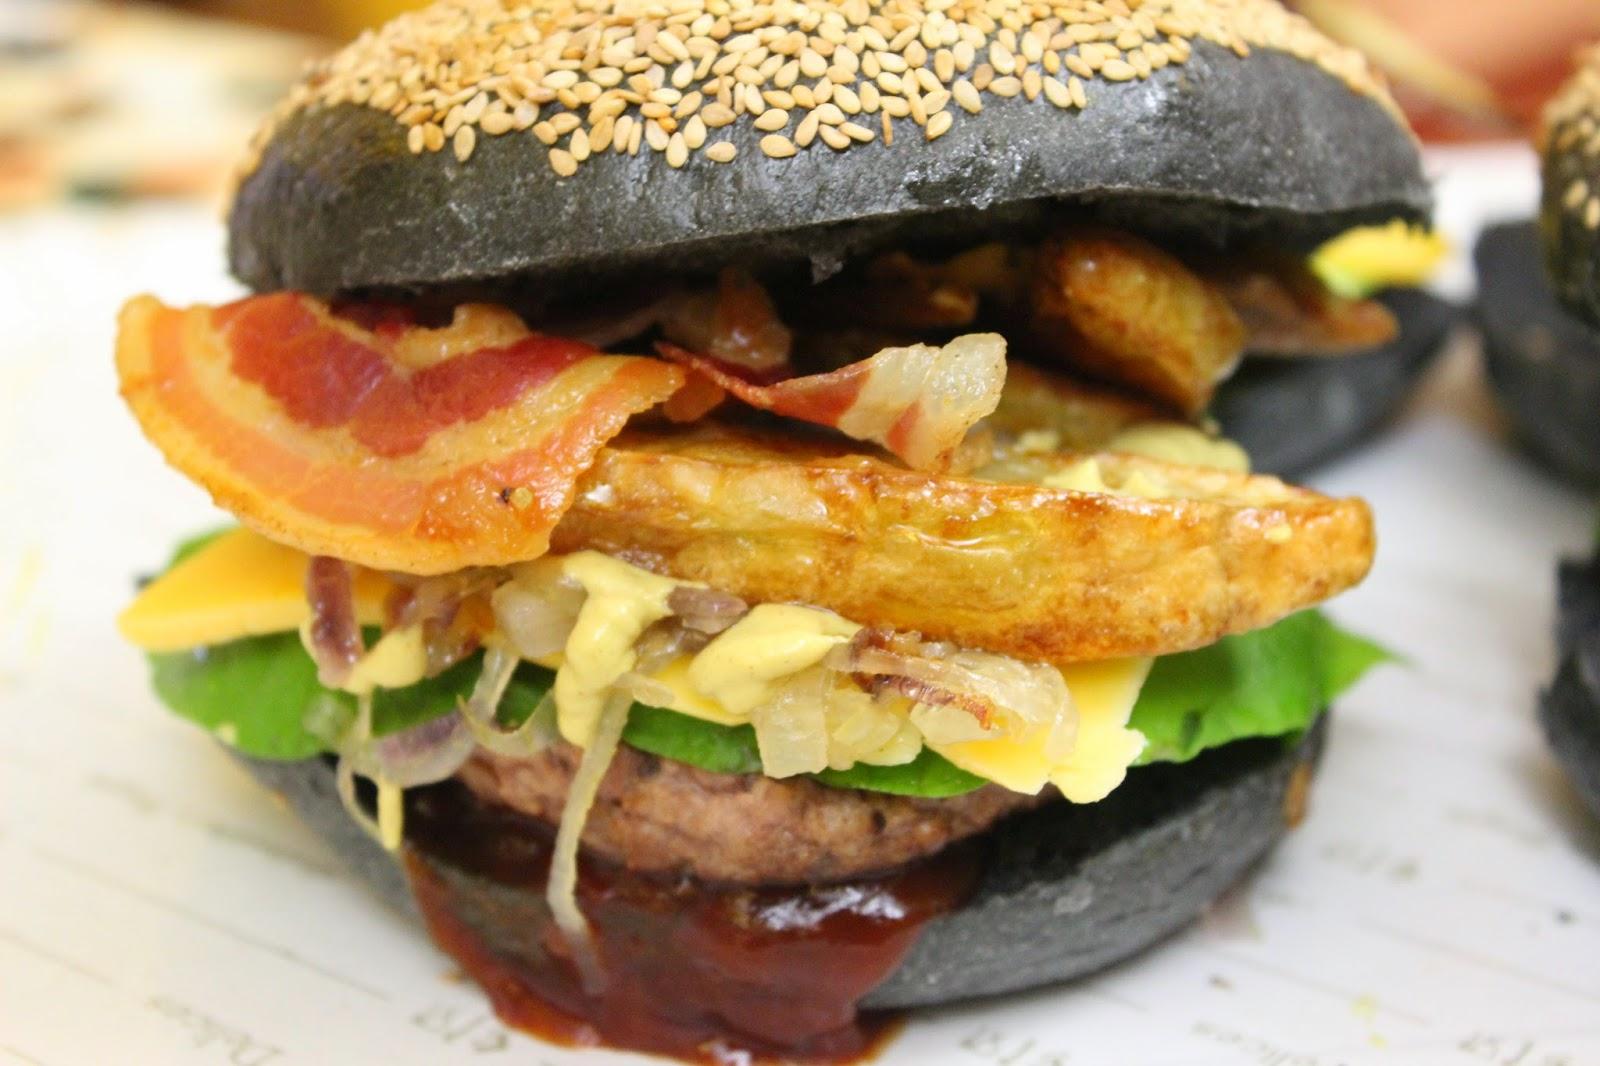 spesso Pane per hamburger con carbone vegetale, ricetta ID57